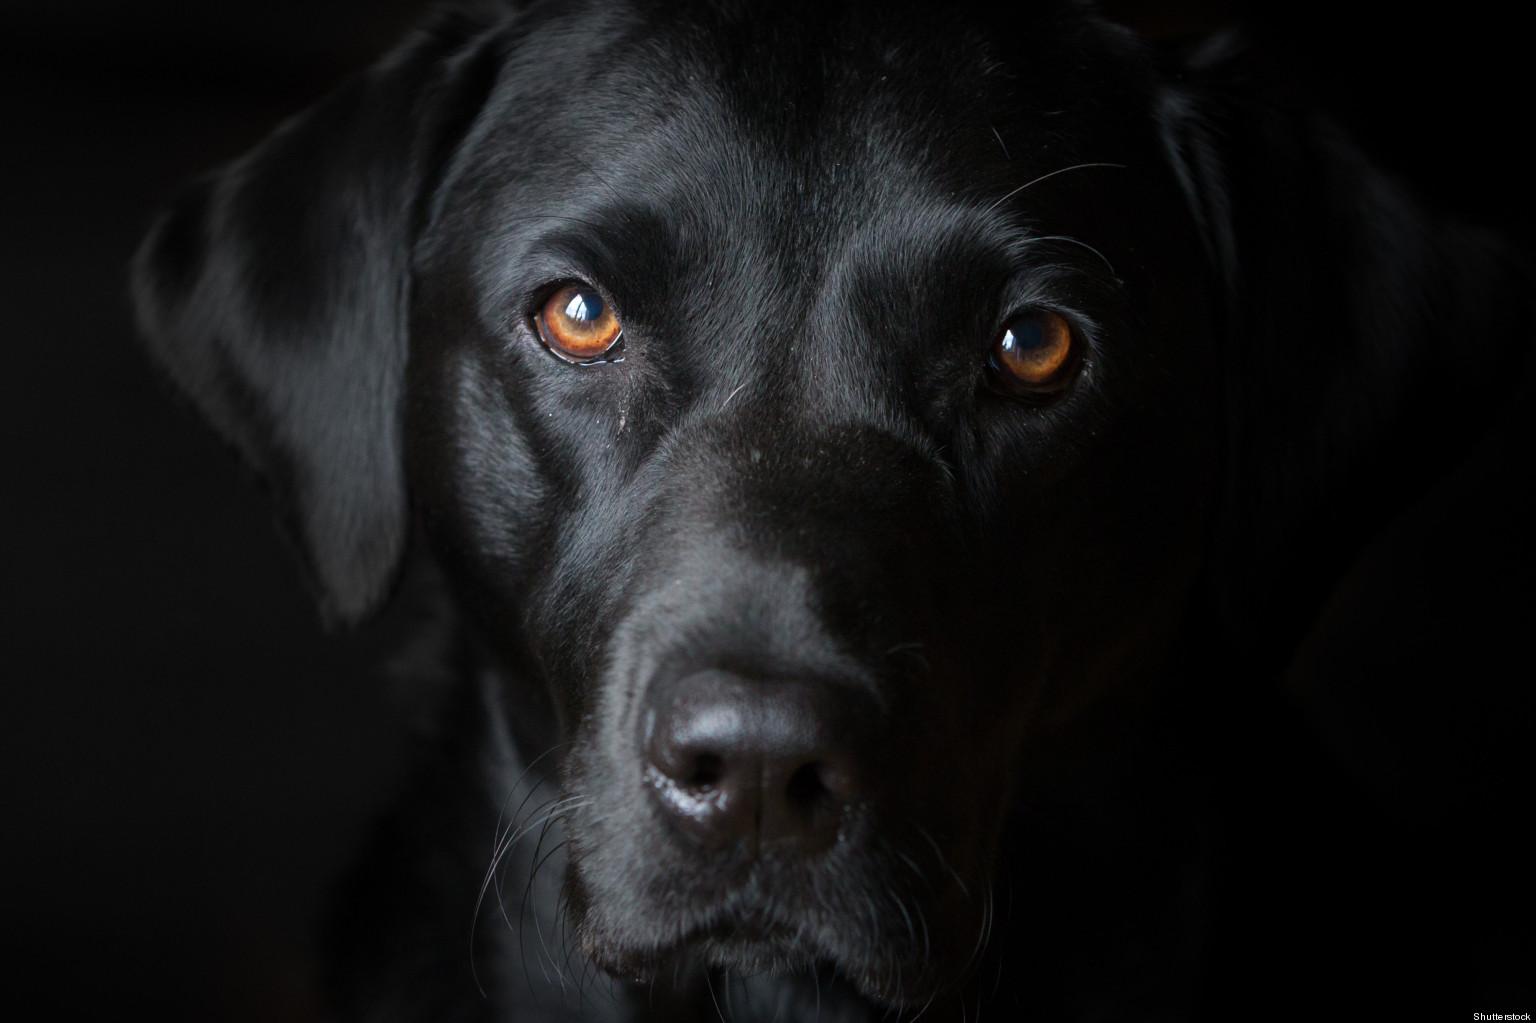 Beautiful Girl Face Hd Desktop Wallpaper Black Dog Wallpaper 1536x1023 84592